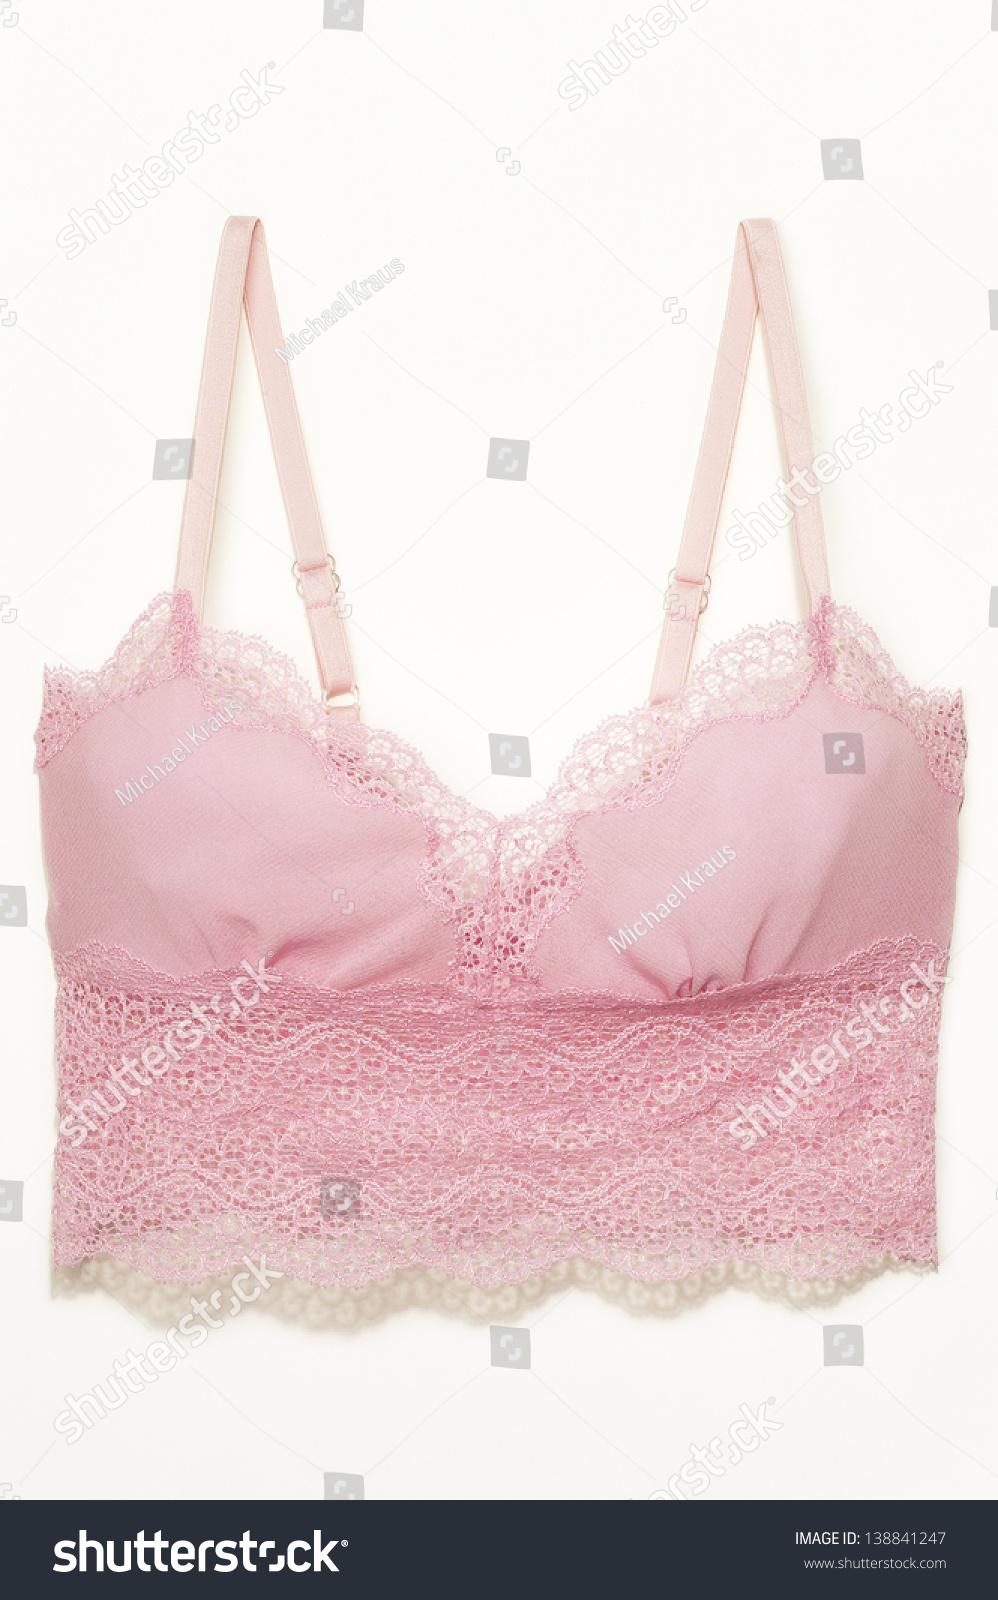 fb4ed3013ee1 Pink Camisole Bra Stock Photo (Edit Now) 138841247 - Shutterstock